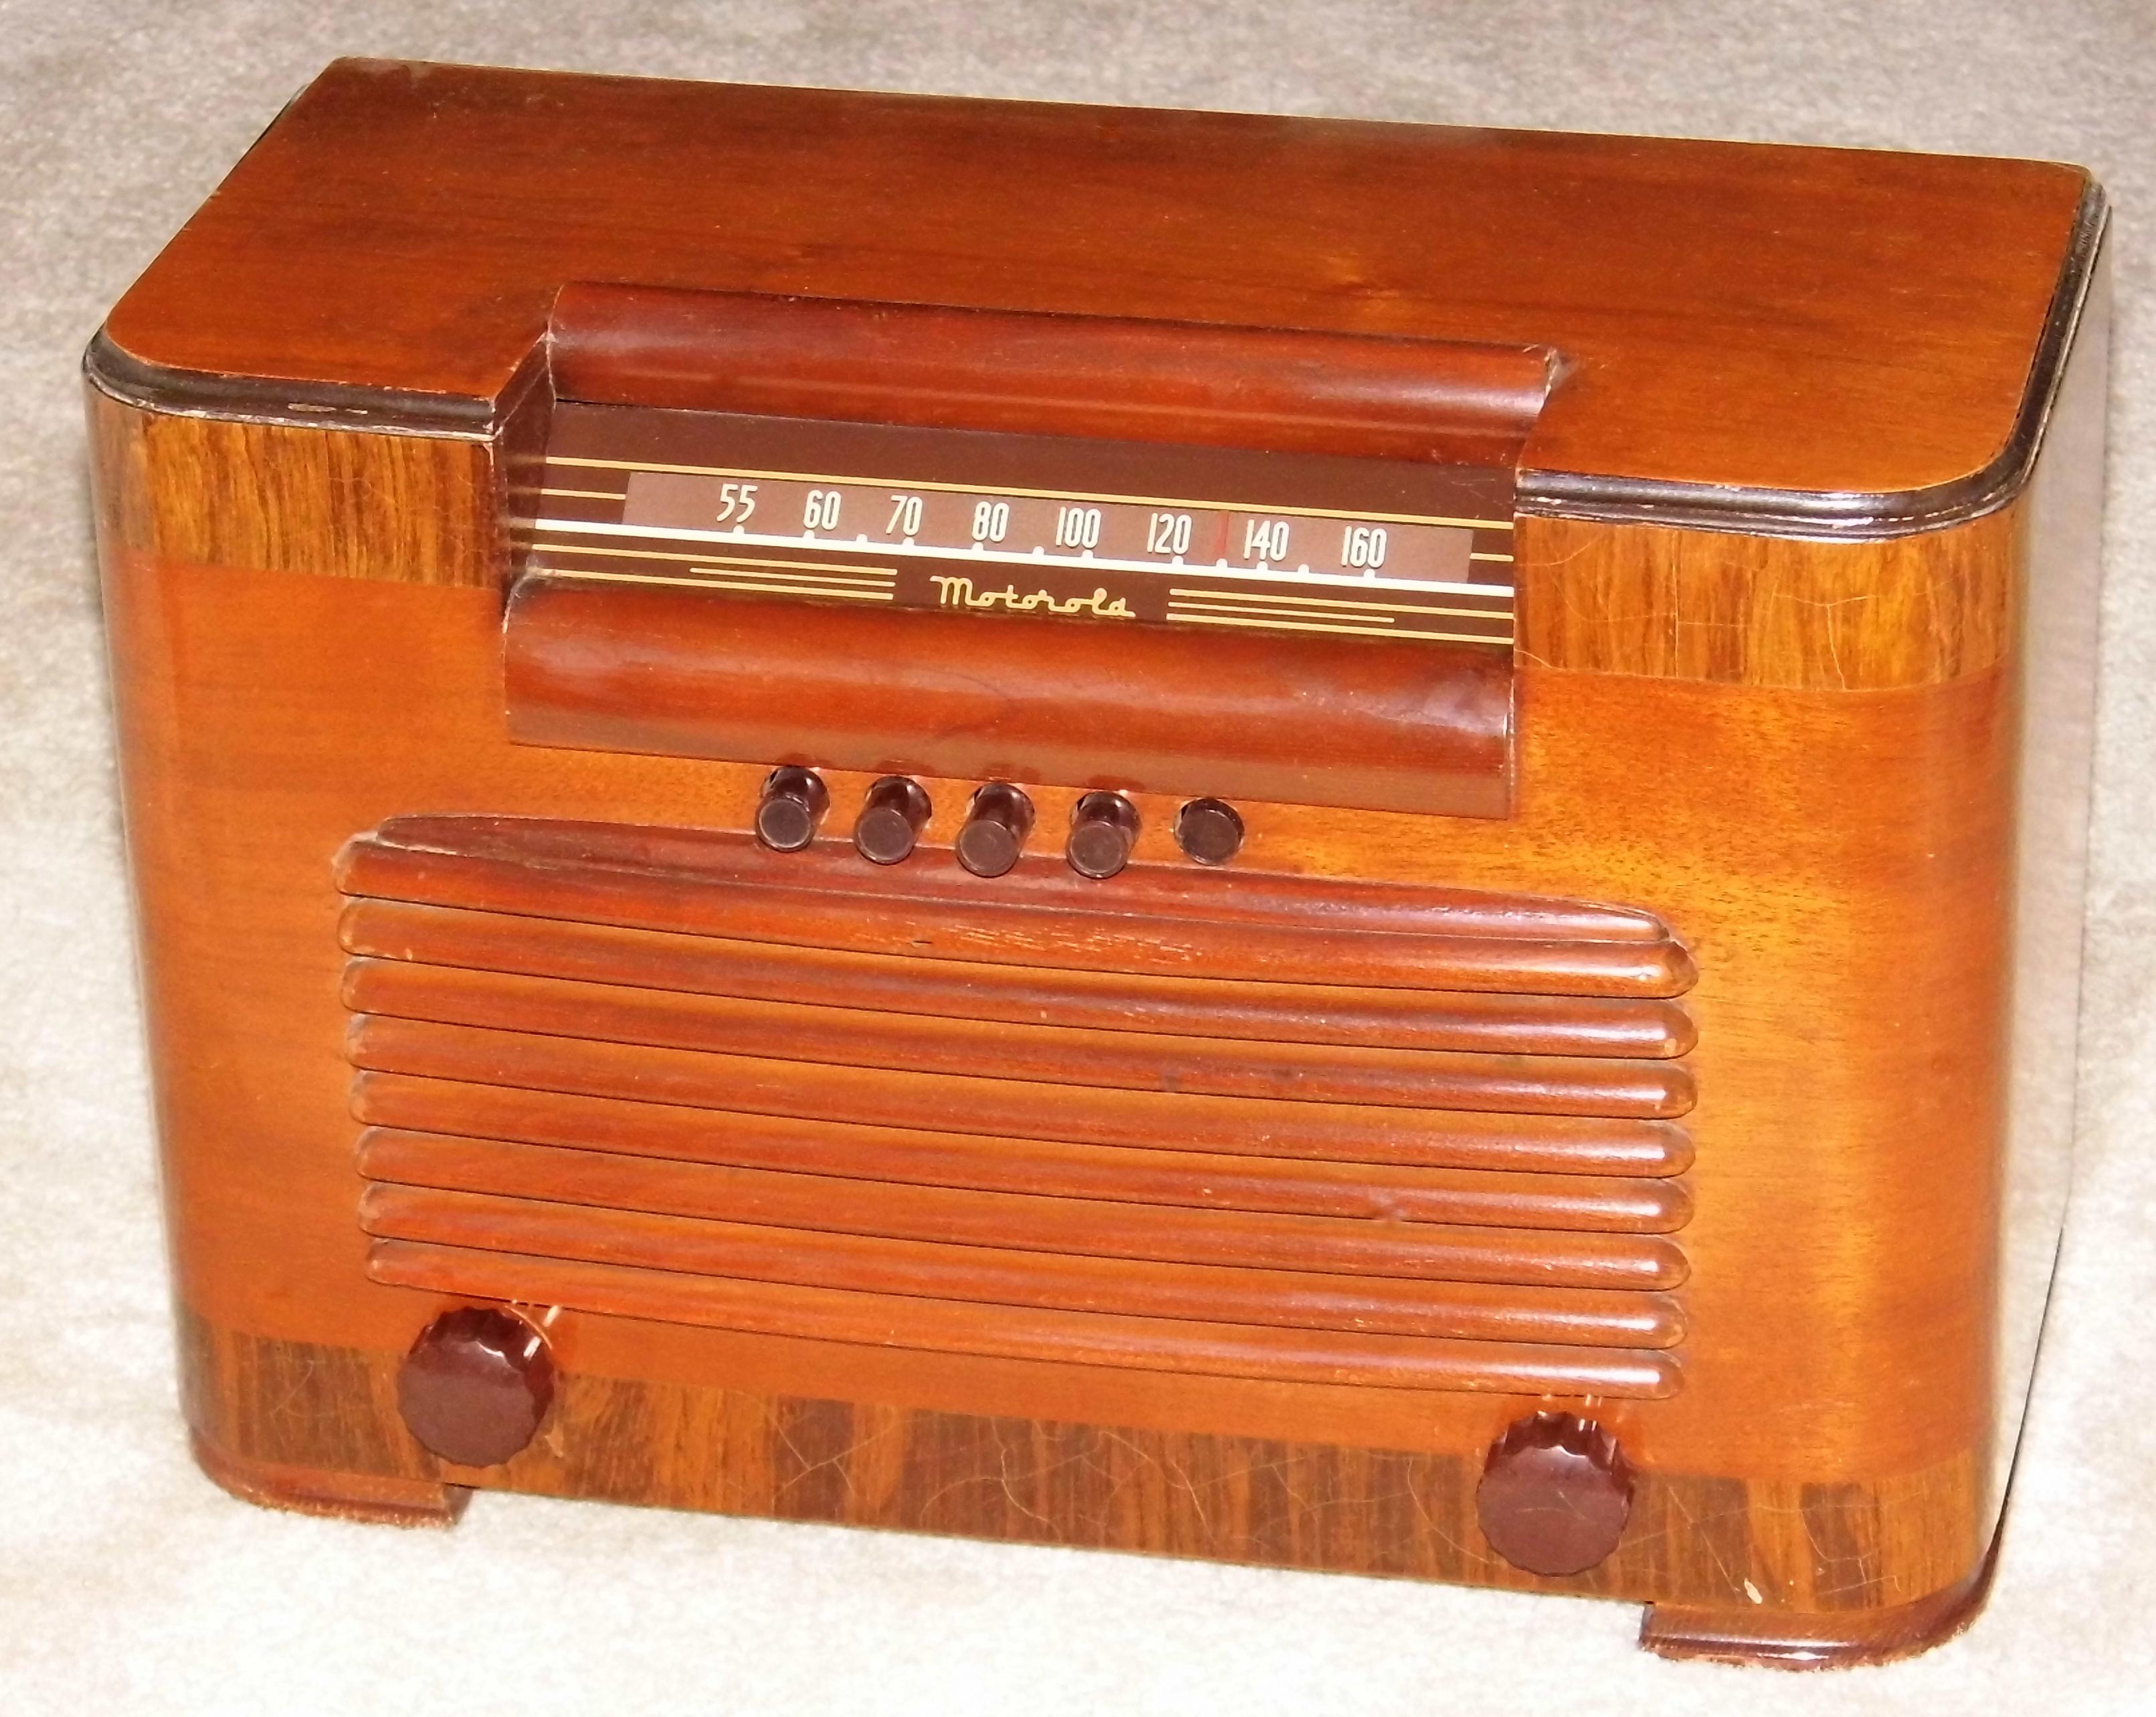 Vintage_Motorola_Tube_Table_Radio%2C_Model_61X14%2C_Broadcast_Band_%28MW%29%2C_6_Tubes%2C_Circa_1941_-_1942_%2814878759594%29 Incroyable De Table Vintage Des Idées